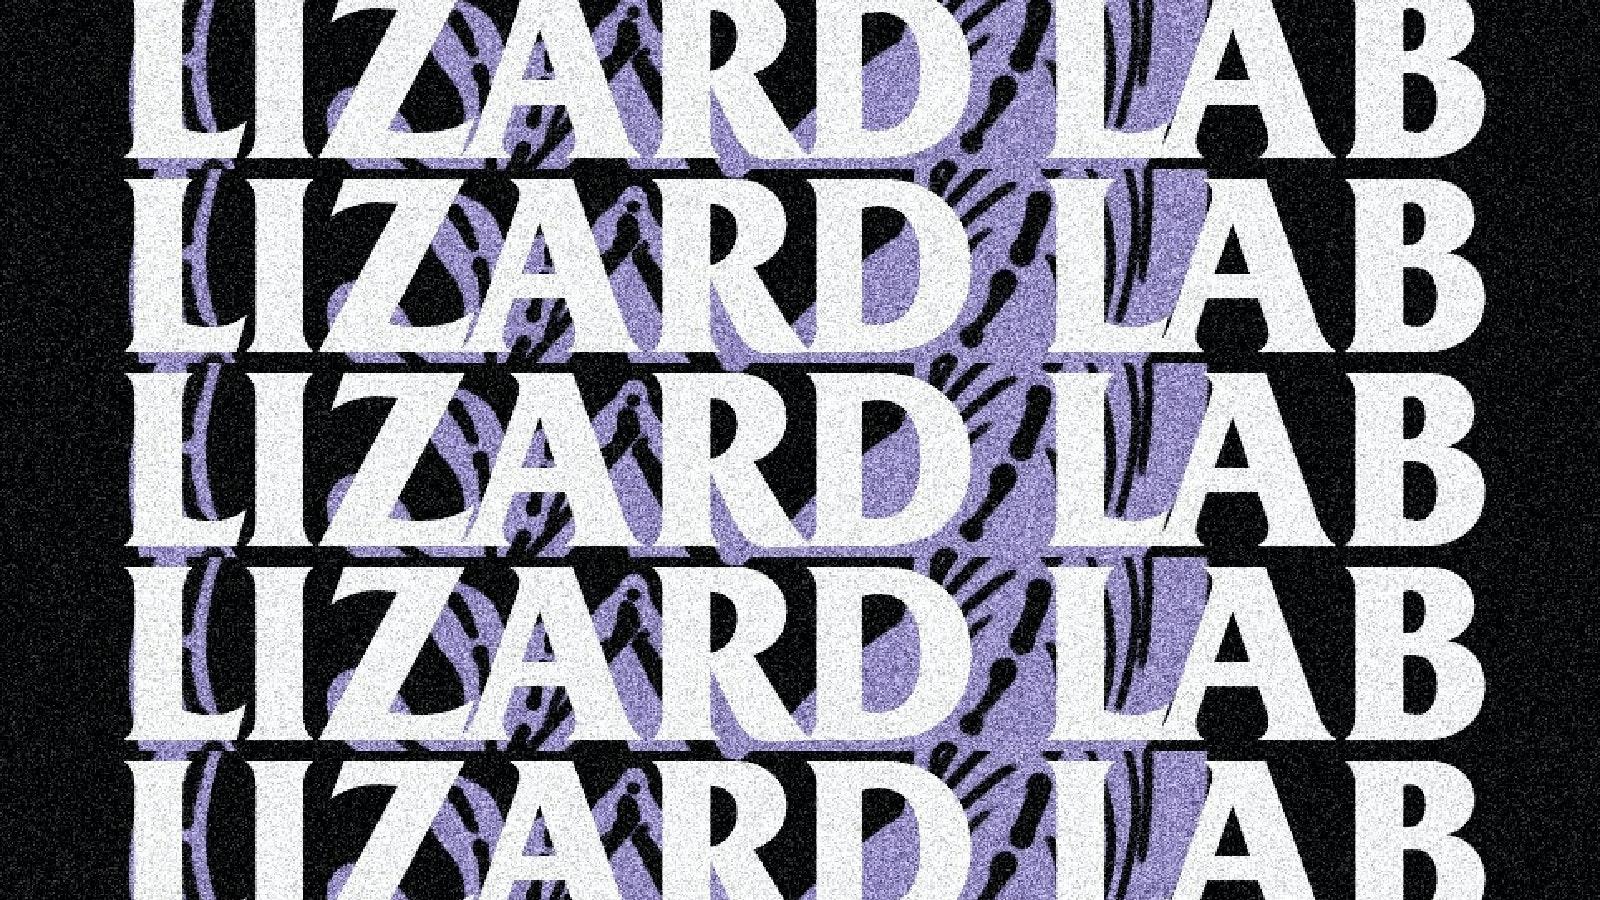 Lizard Lab / The Claremonts / Waterside